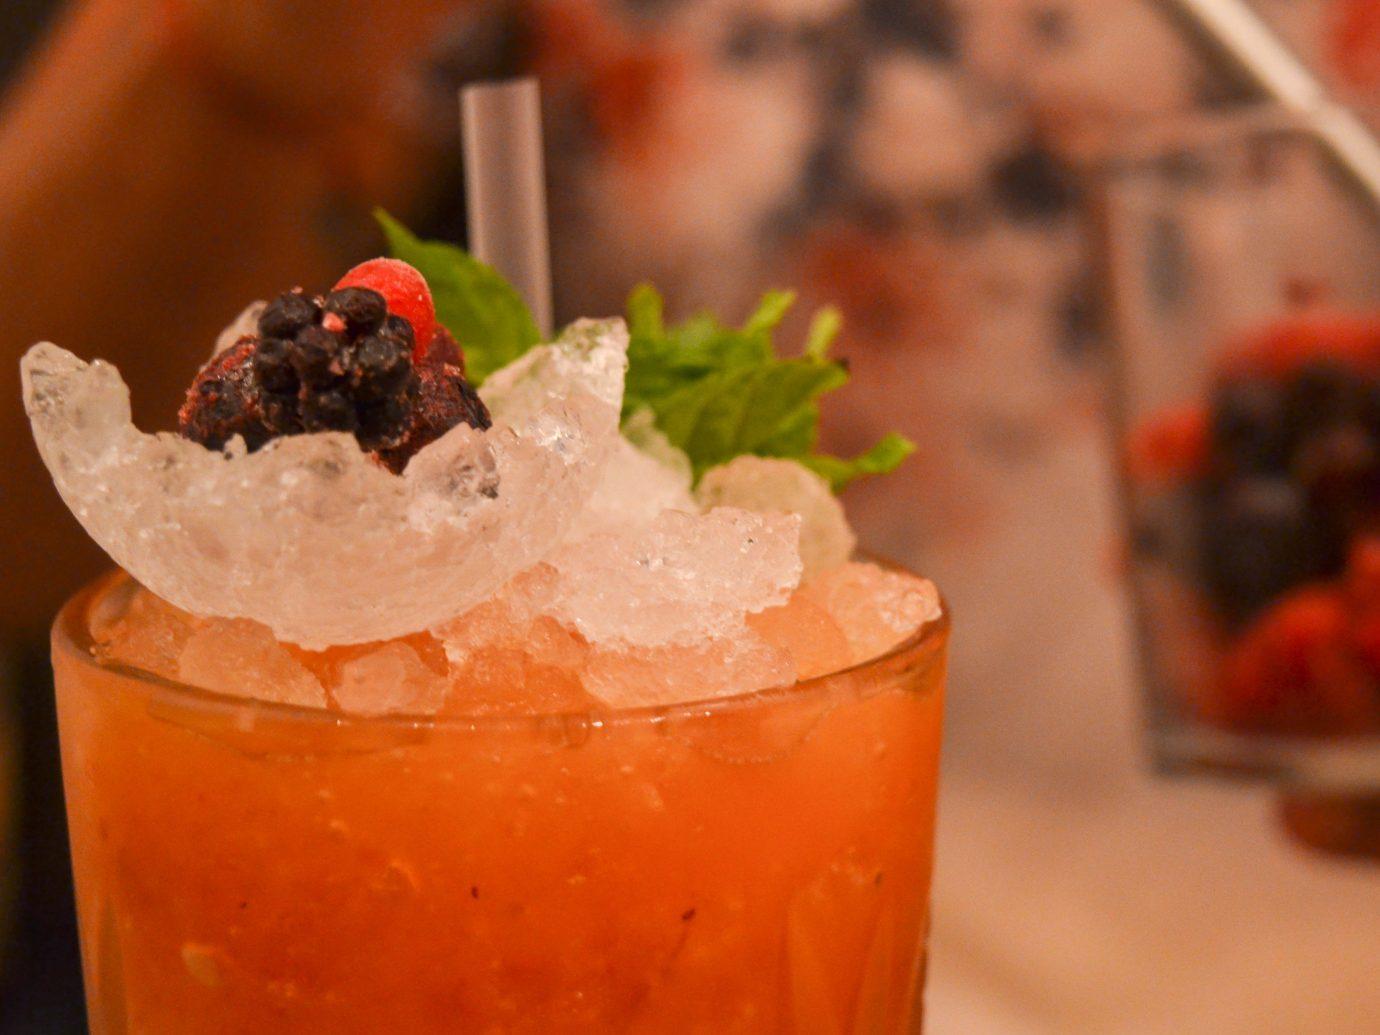 Trip Ideas cup food orange indoor cocktail Drink alcoholic beverage produce mai tai beverage cuisine close fresh